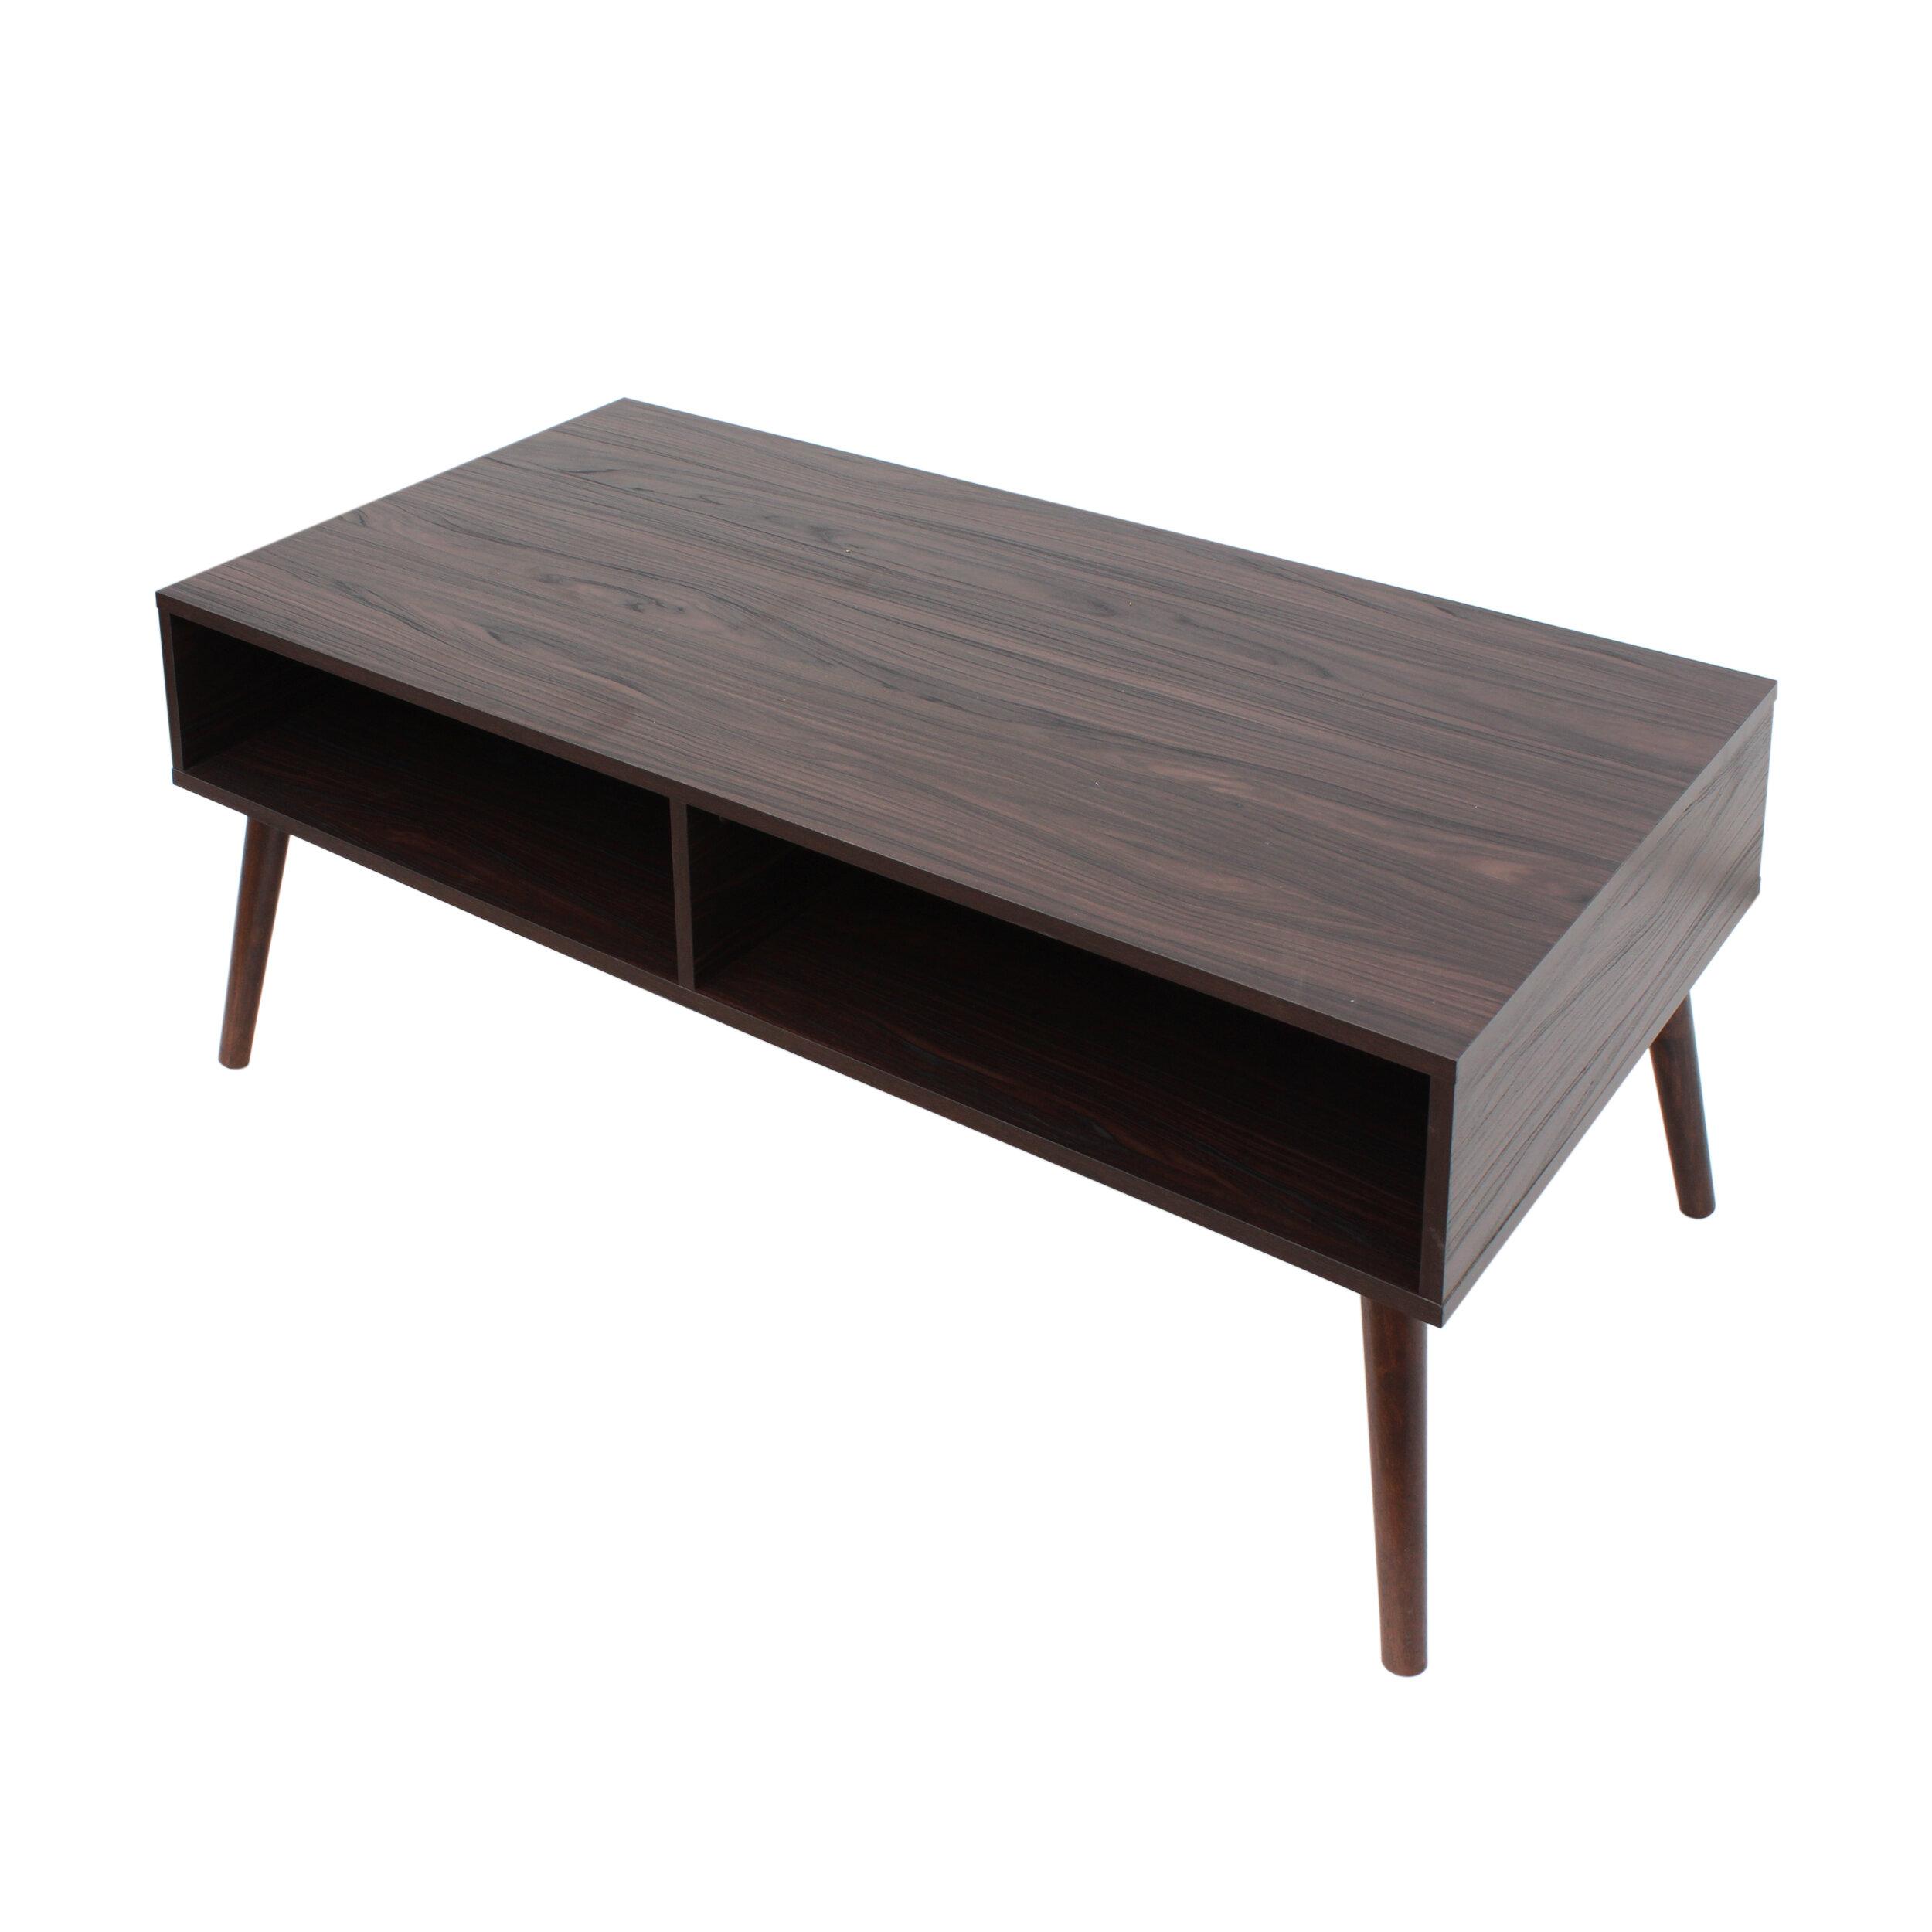 Wrought Studio Goetsch Mid Century Modern Coffee Table Reviews